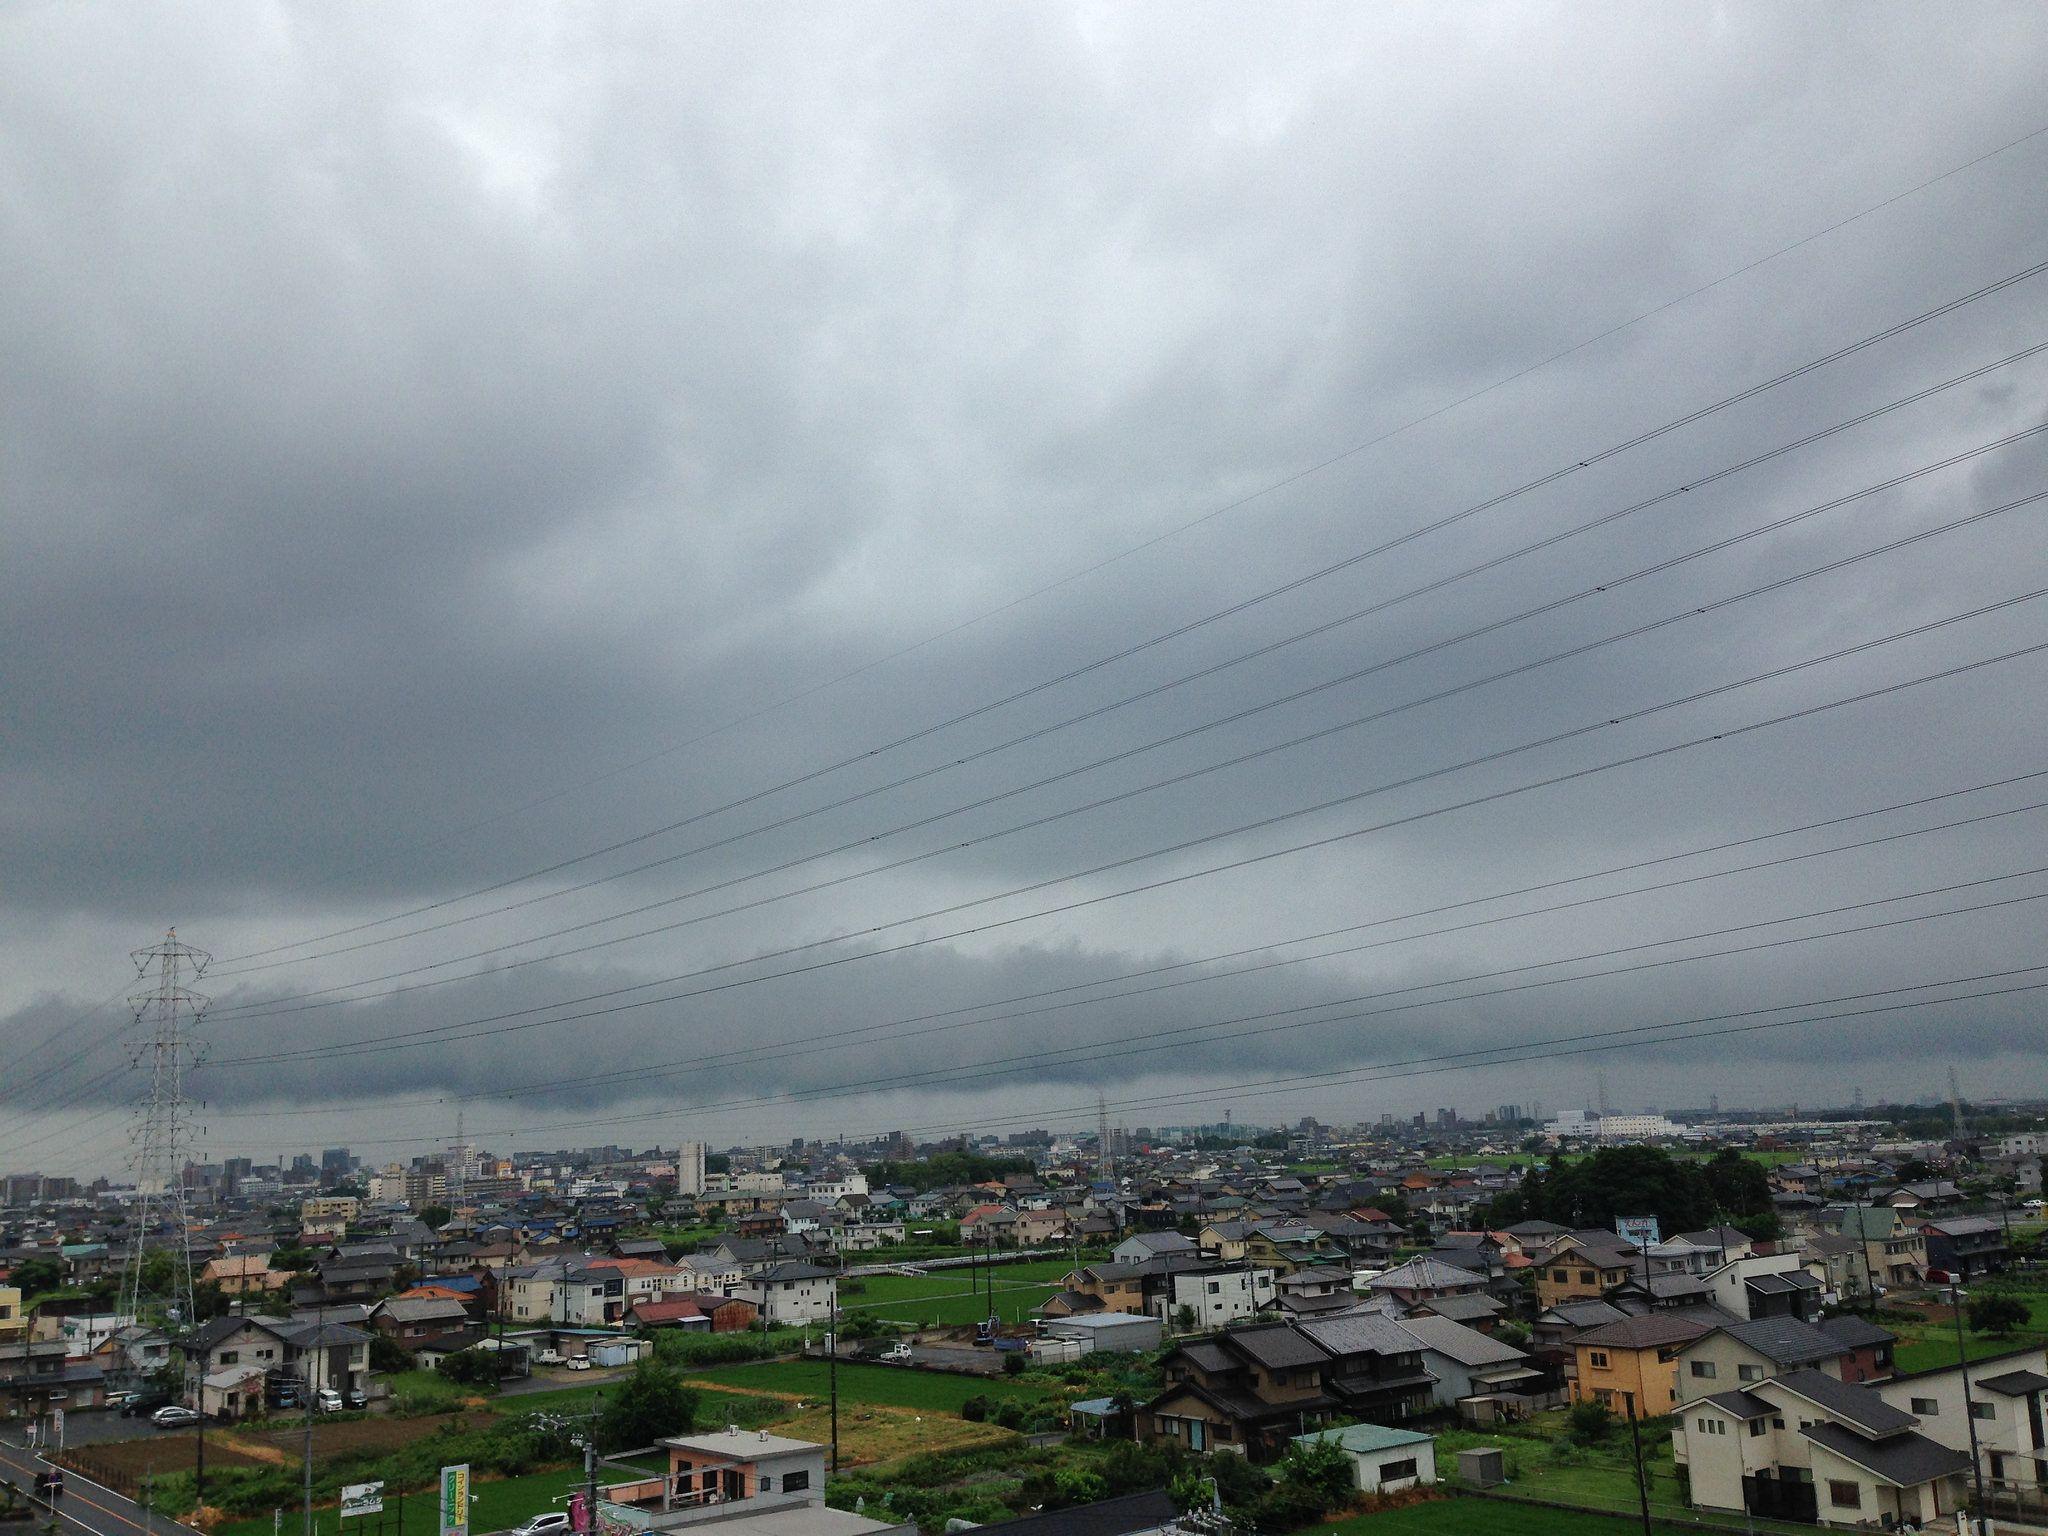 https://flic.kr/p/WdJFCJ   The harbinger of typhoons 02   台風が近づきつつある今朝の空模様です。 This typhoon is approaching this morning's sky.